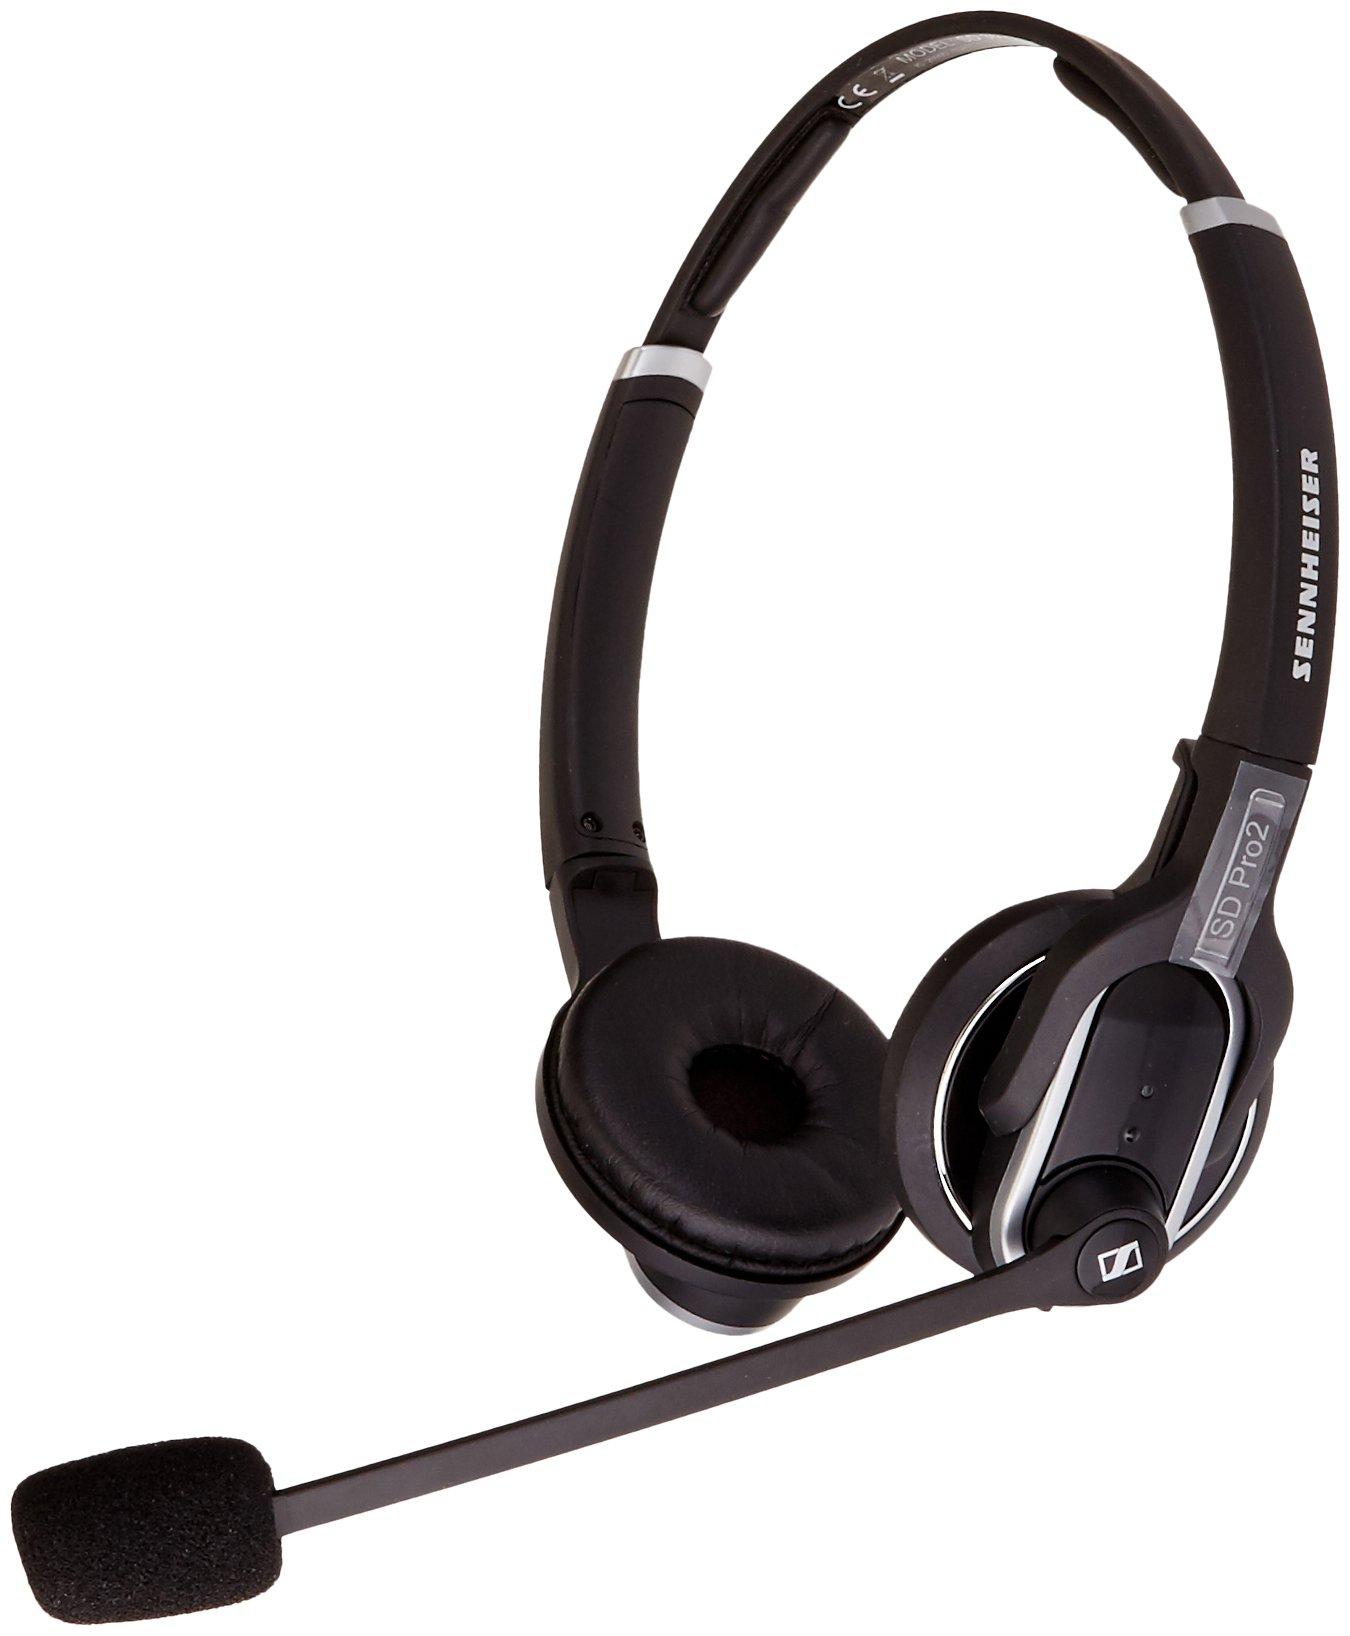 Sennheiser Enterprise Solution 615104247338 SD 30 HS VOIP Telephone Headset